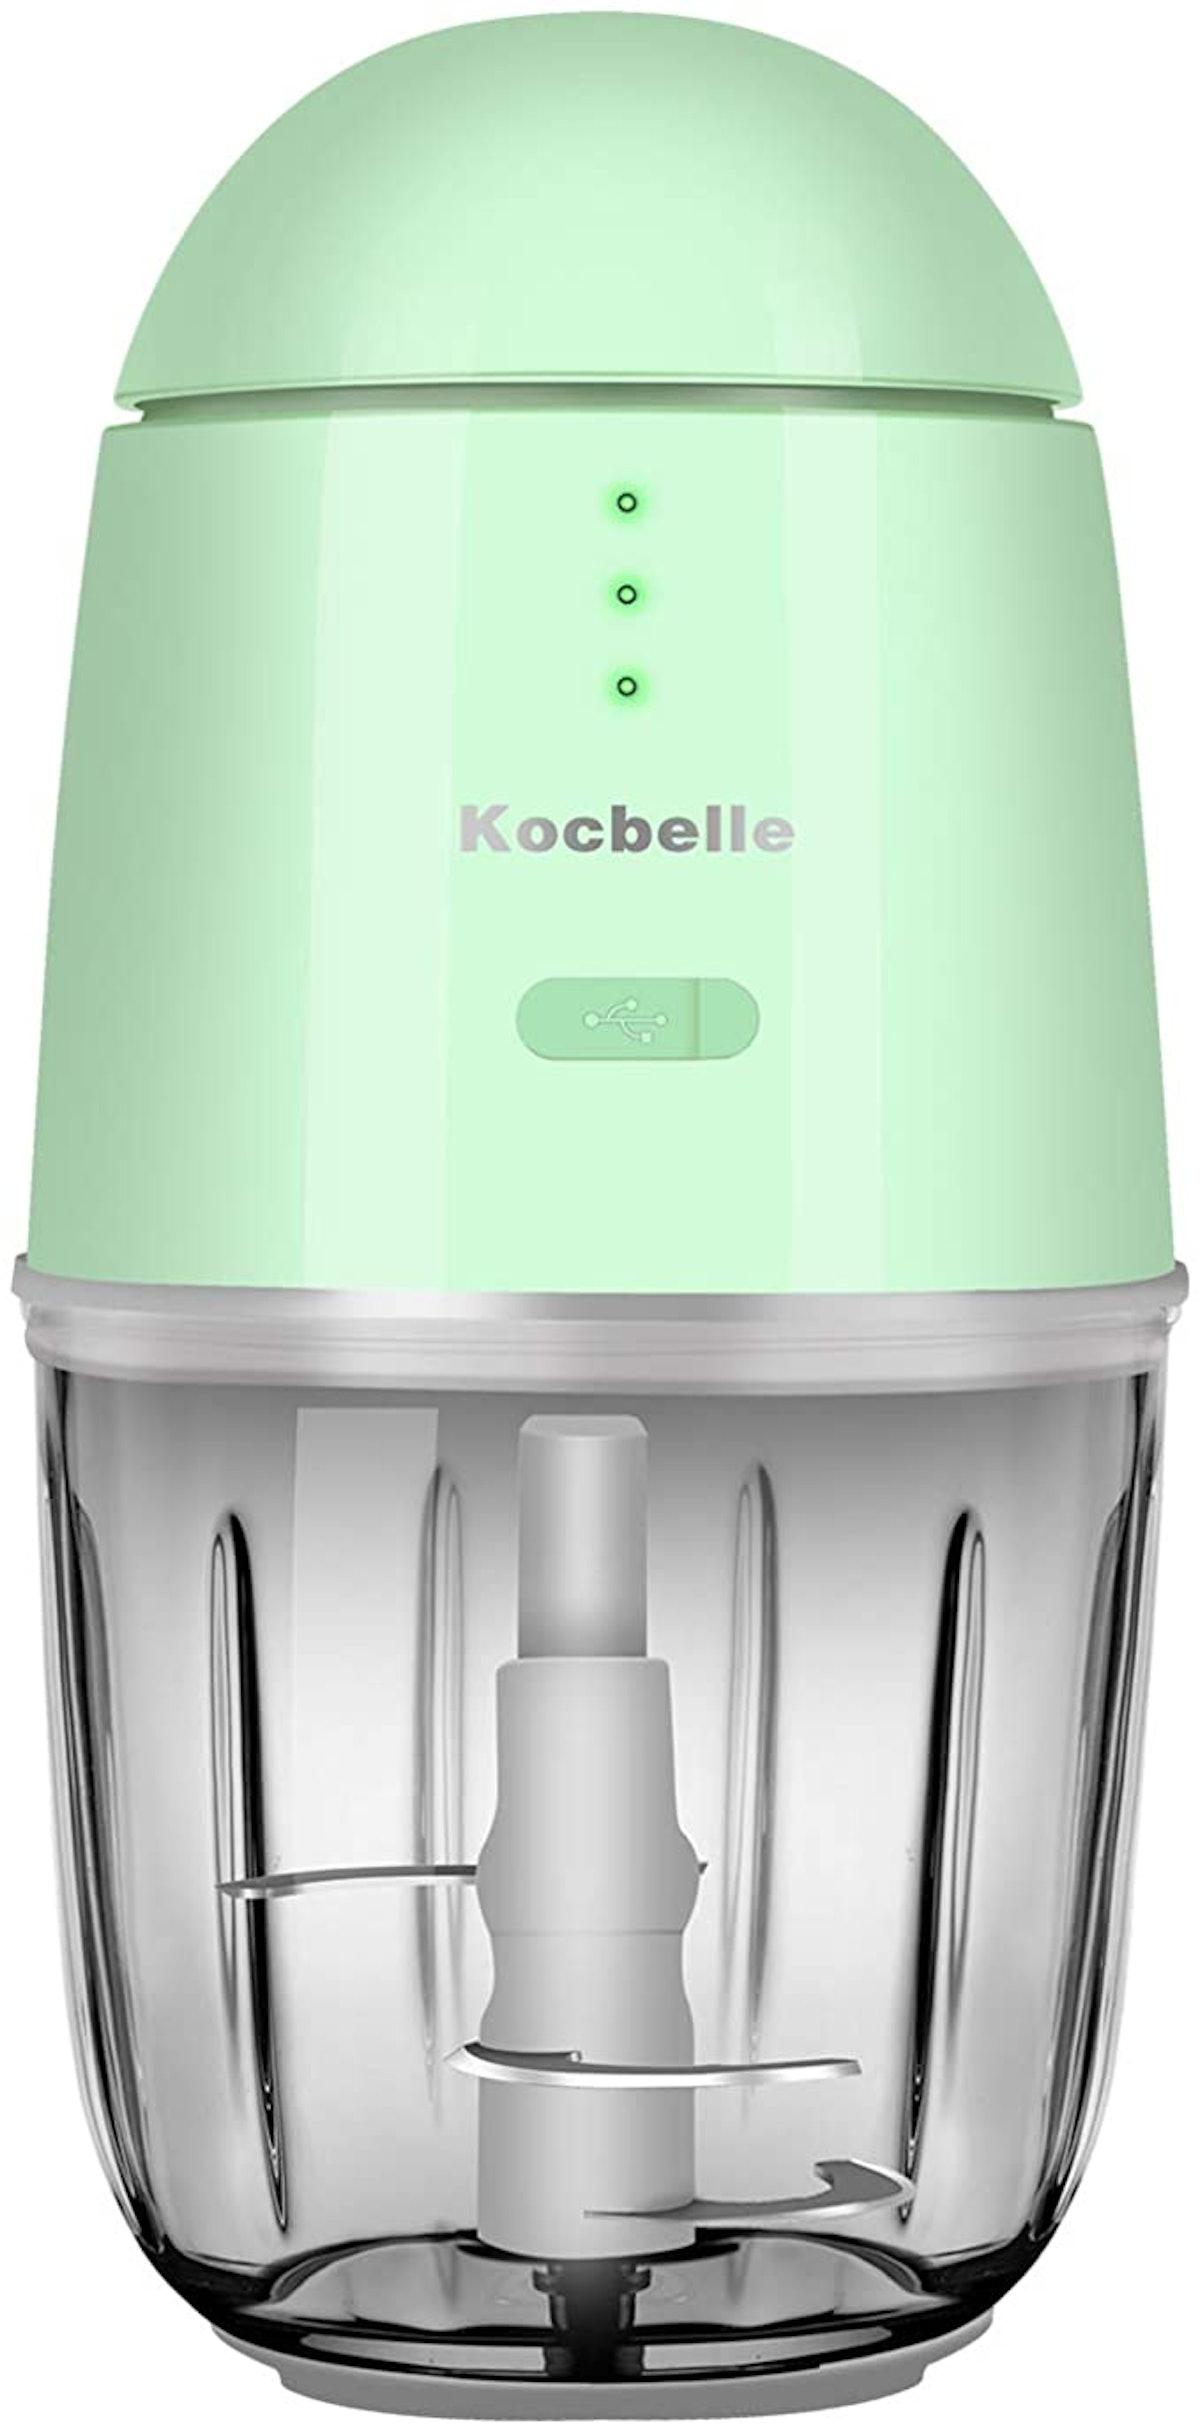 Kocbelle Food Processor